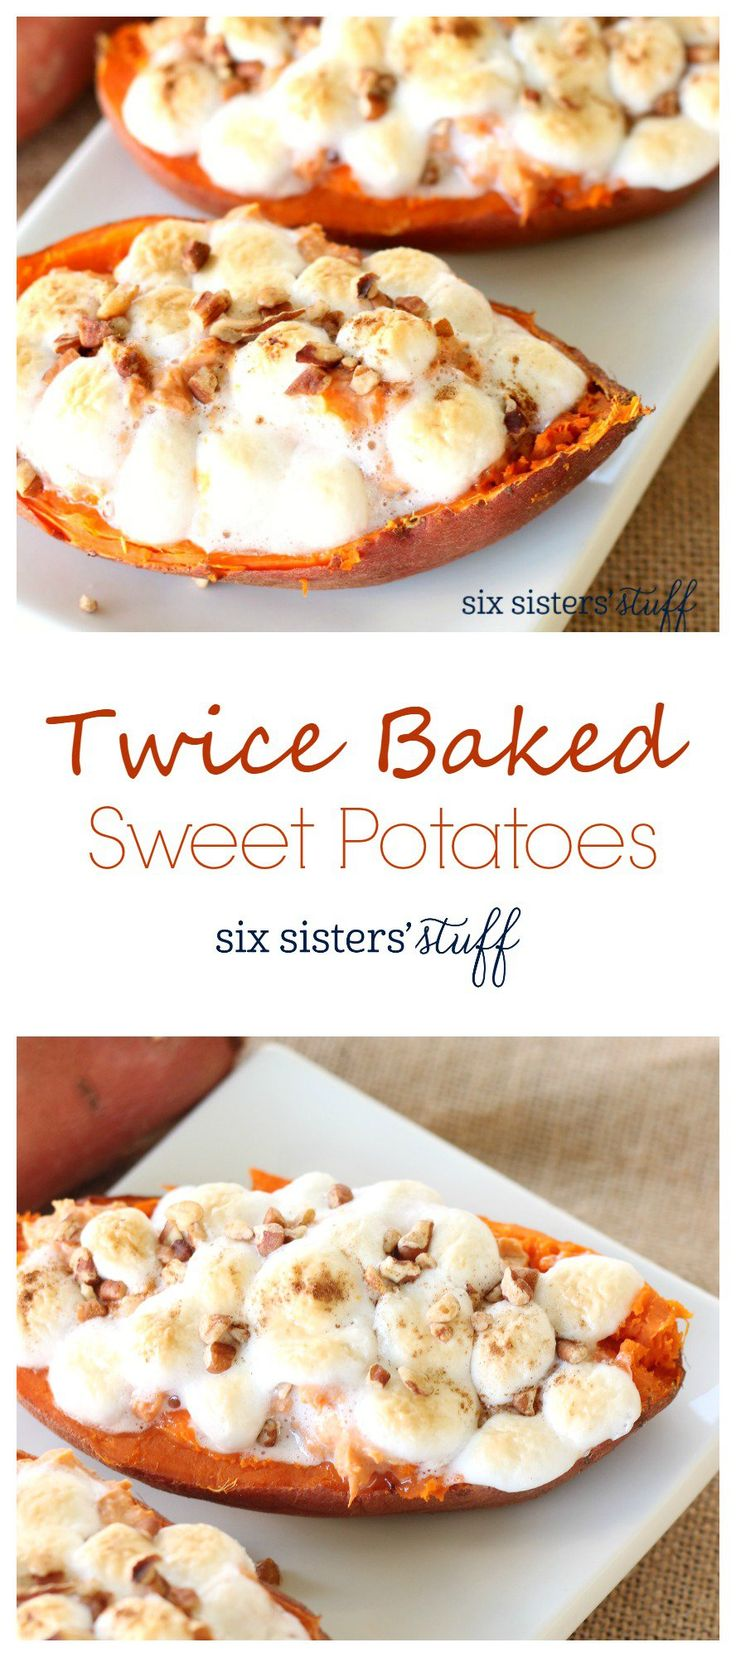 Twice Baked Sweet Potatoes | Six Sisters' Stuff